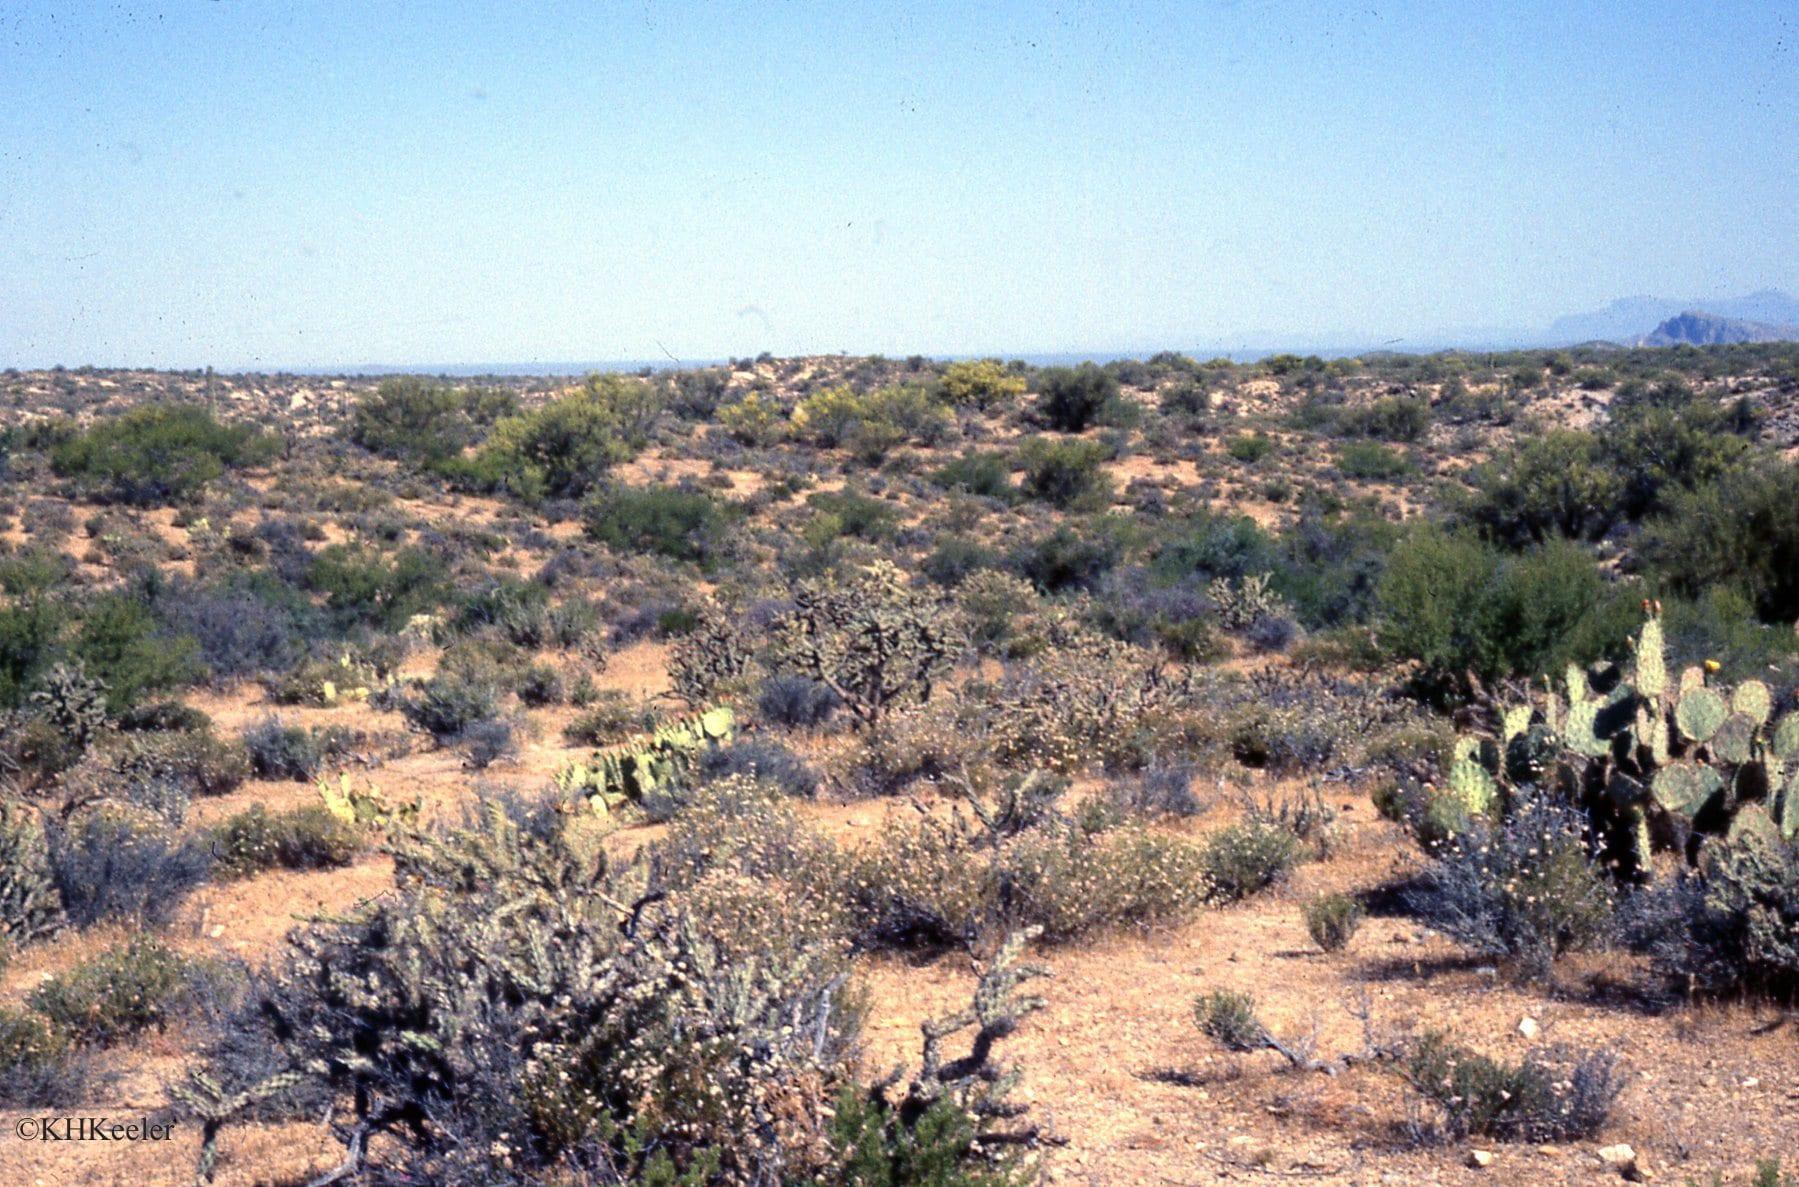 Lower Sonoran desert